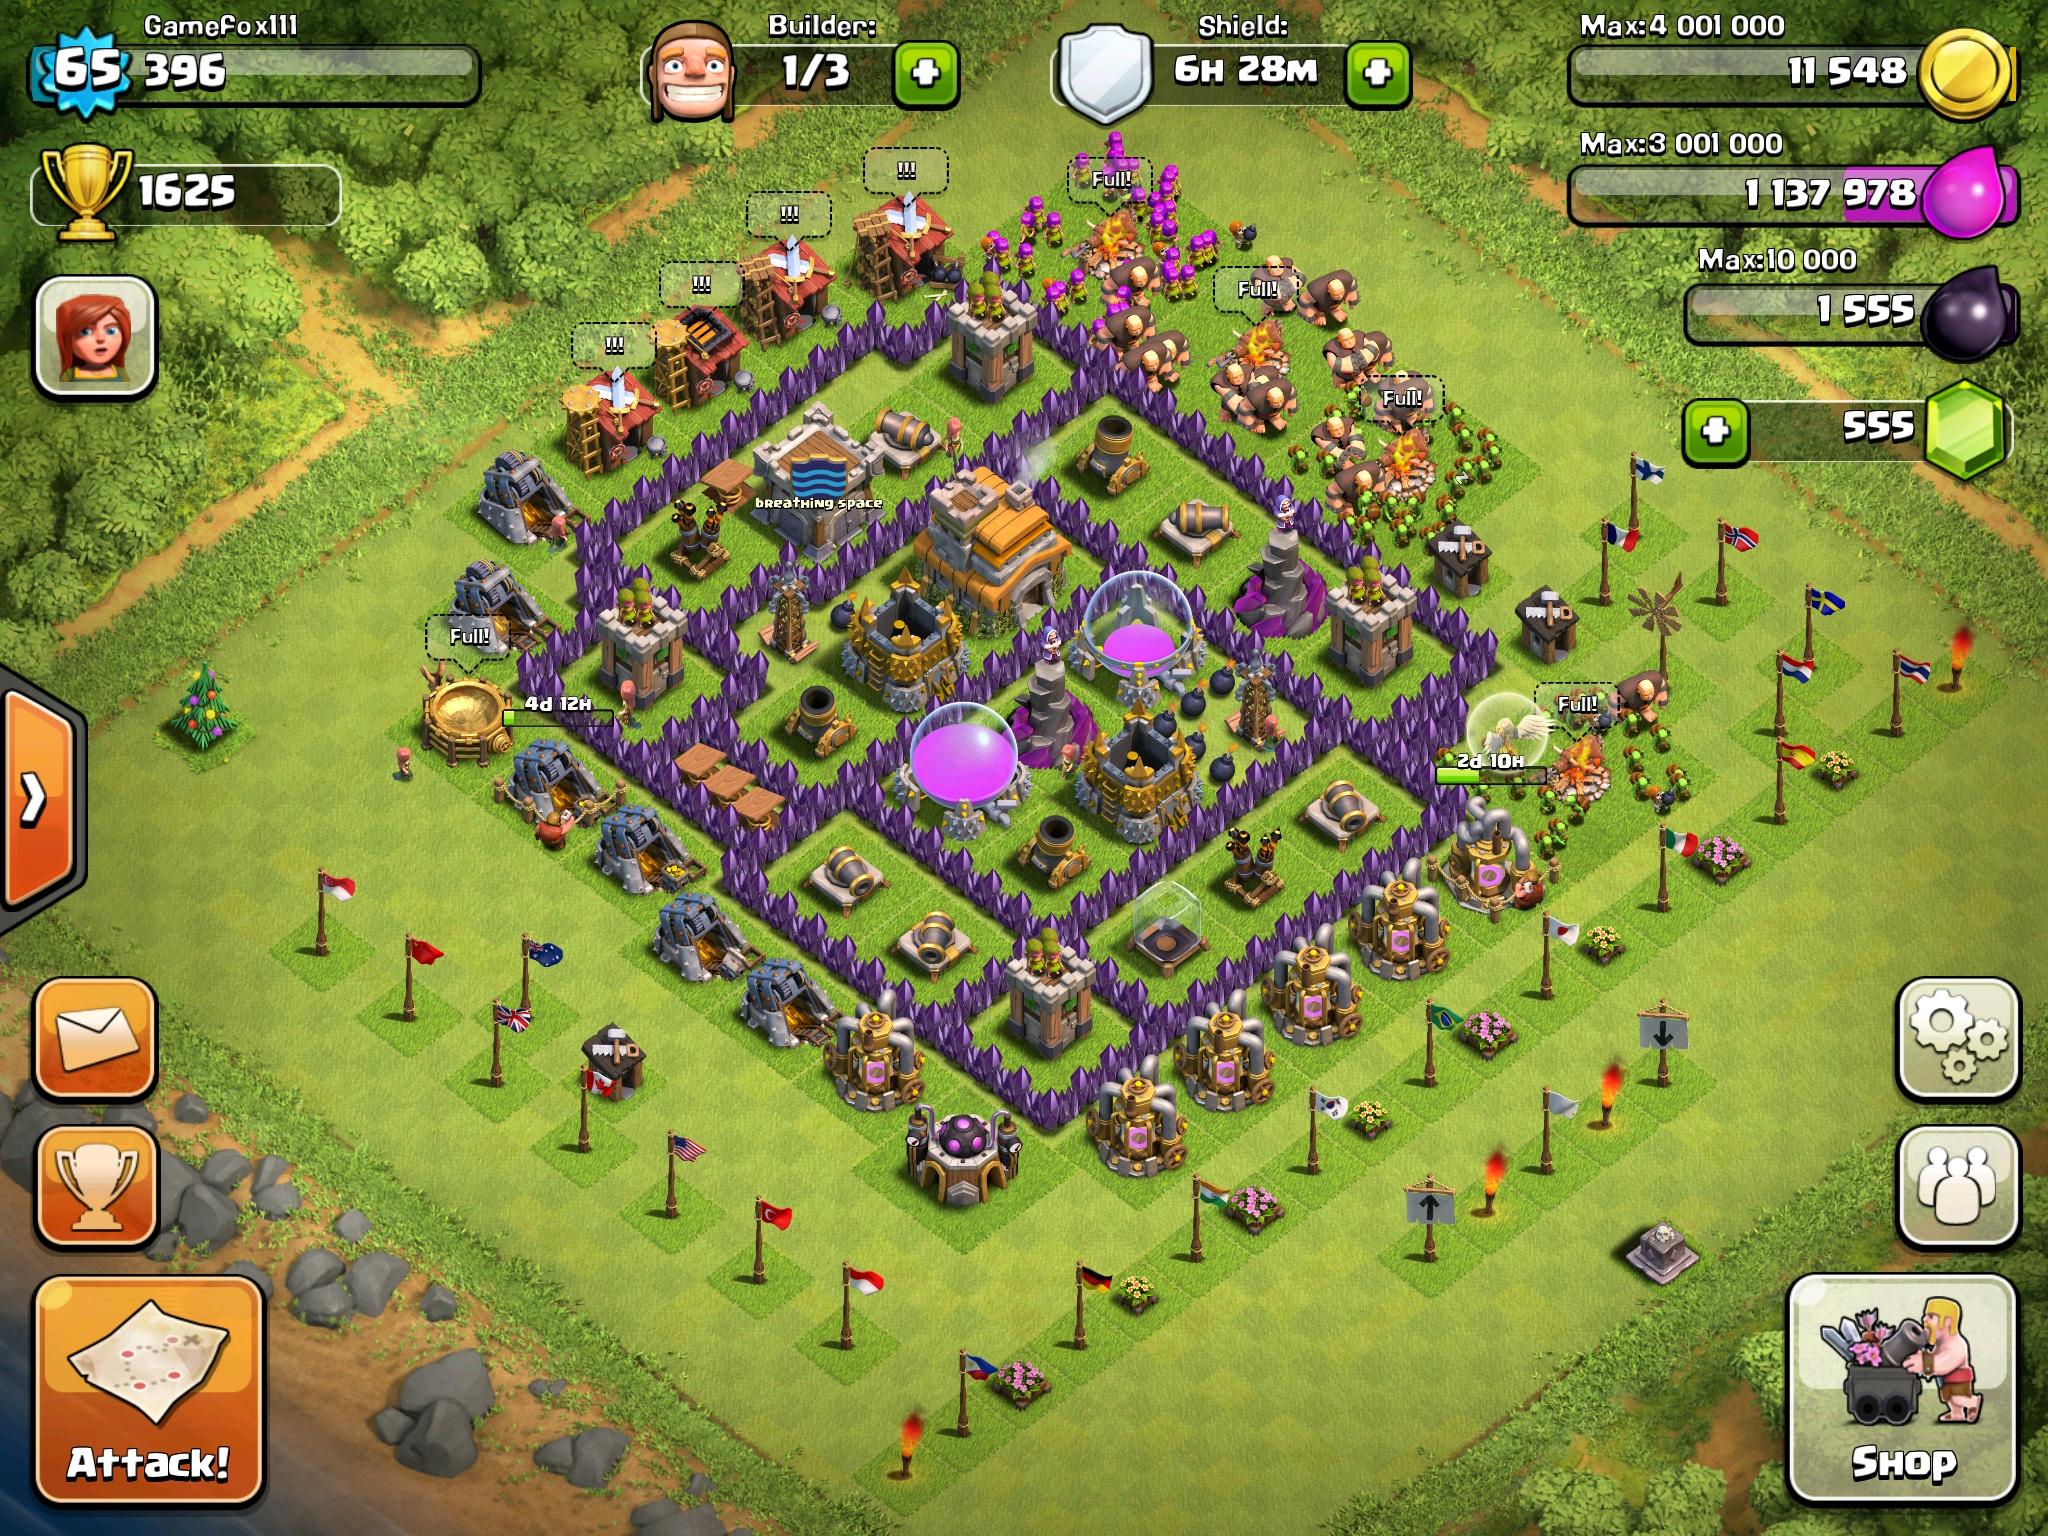 Defending Your Village